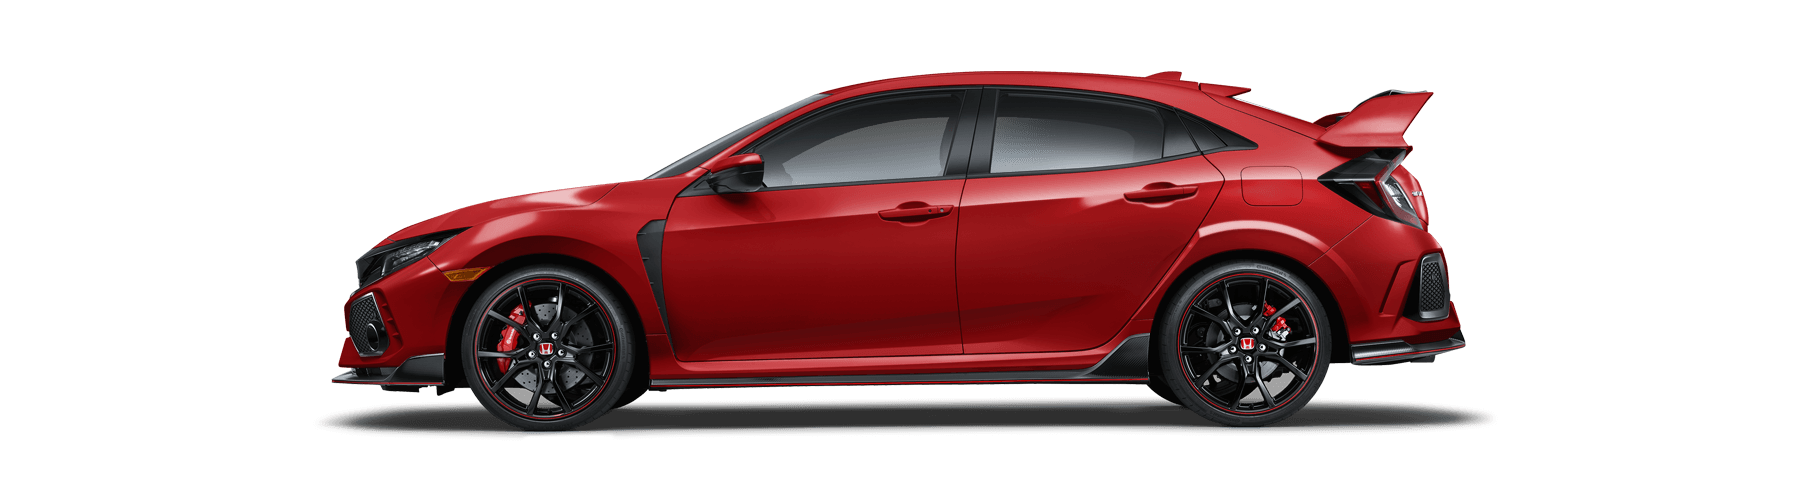 2018 Honda Civic Type R New England Honda Dealers